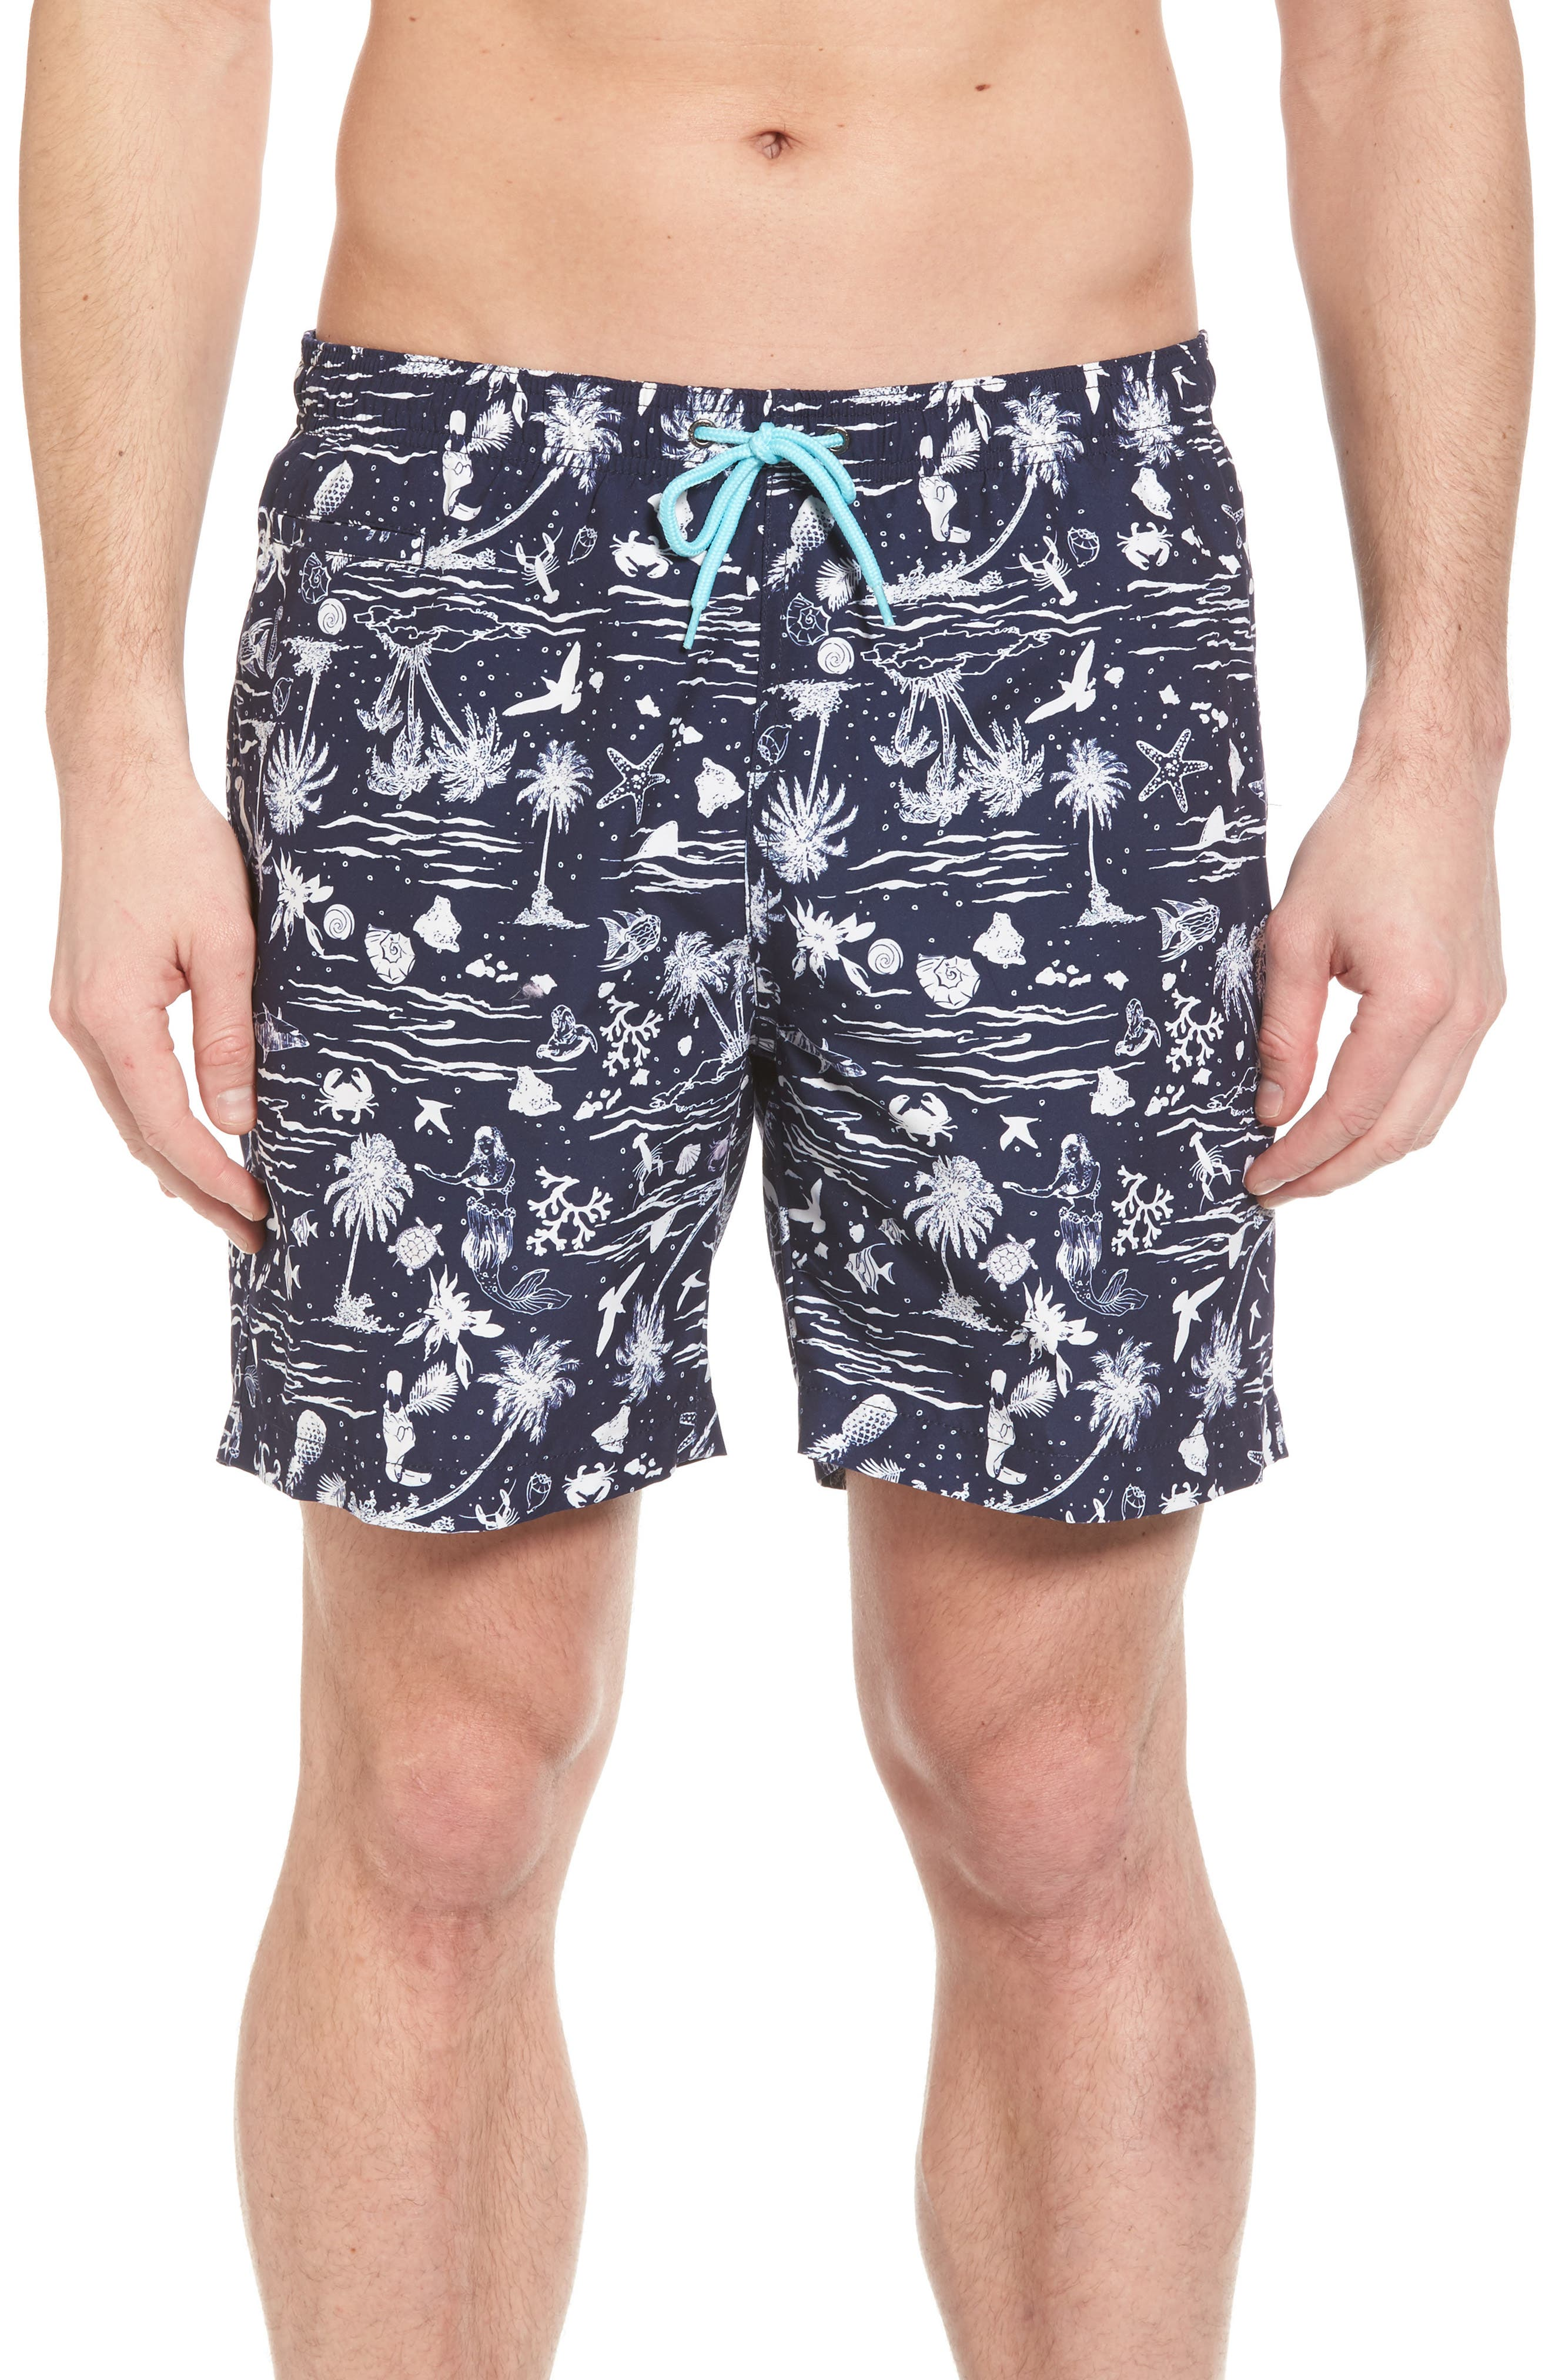 Trunks Surf & Swim Co. Swami Tropical Island Board Shorts